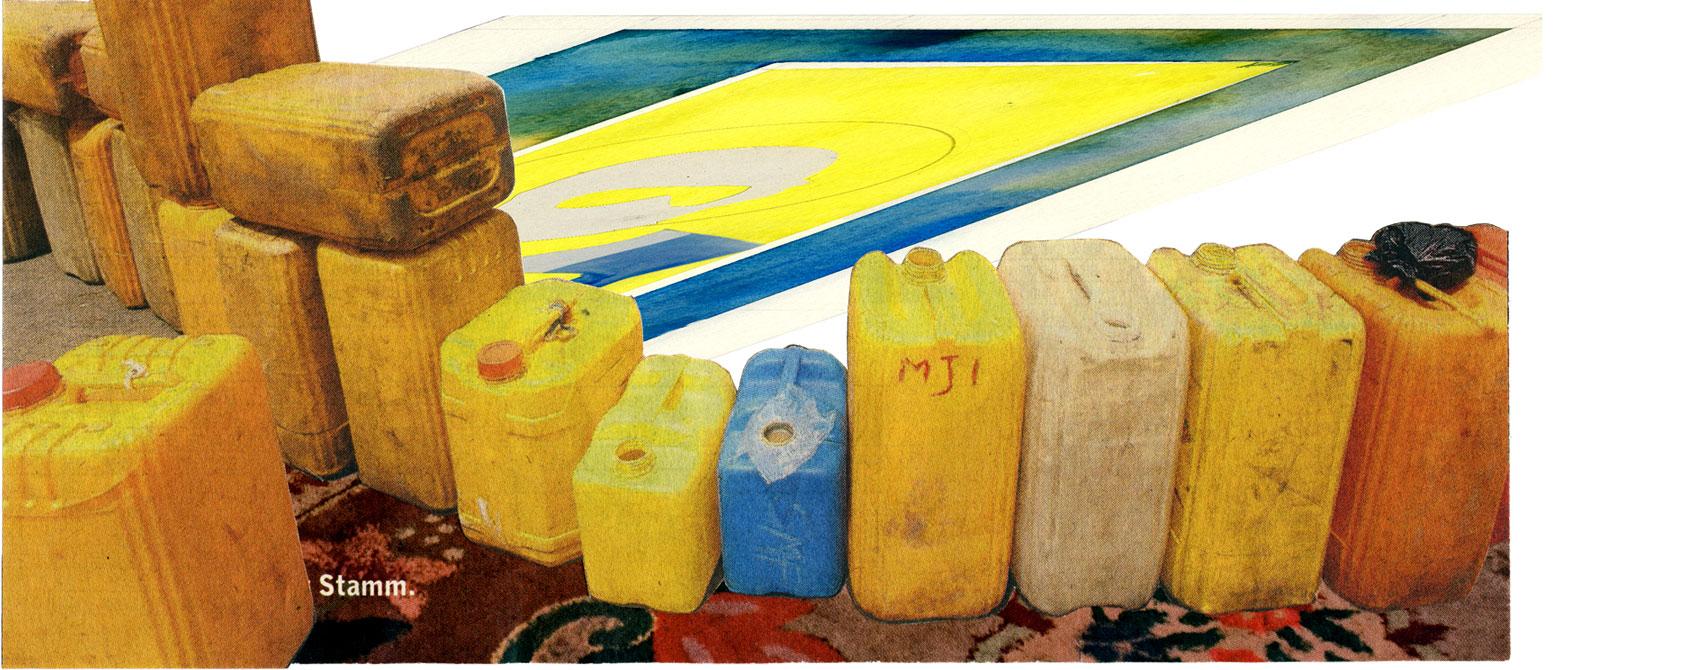 David Berweger's Solo Exhibition, «Progress&drwngs;